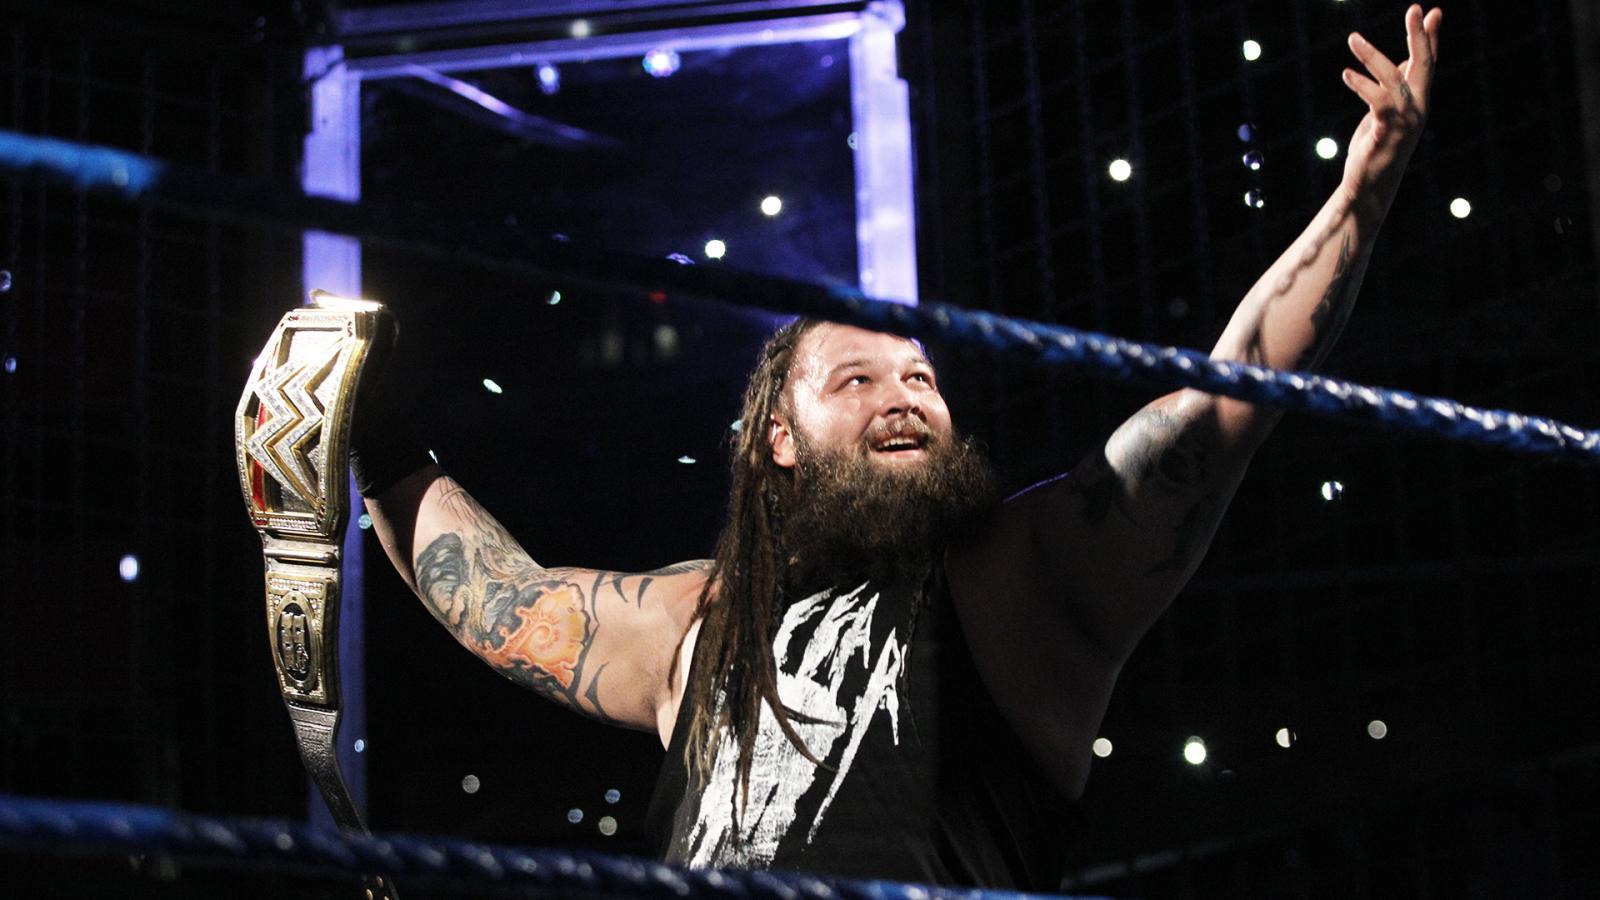 Bray Wyatt's WWE WrestleMania 33 Opportunity is Career Defining